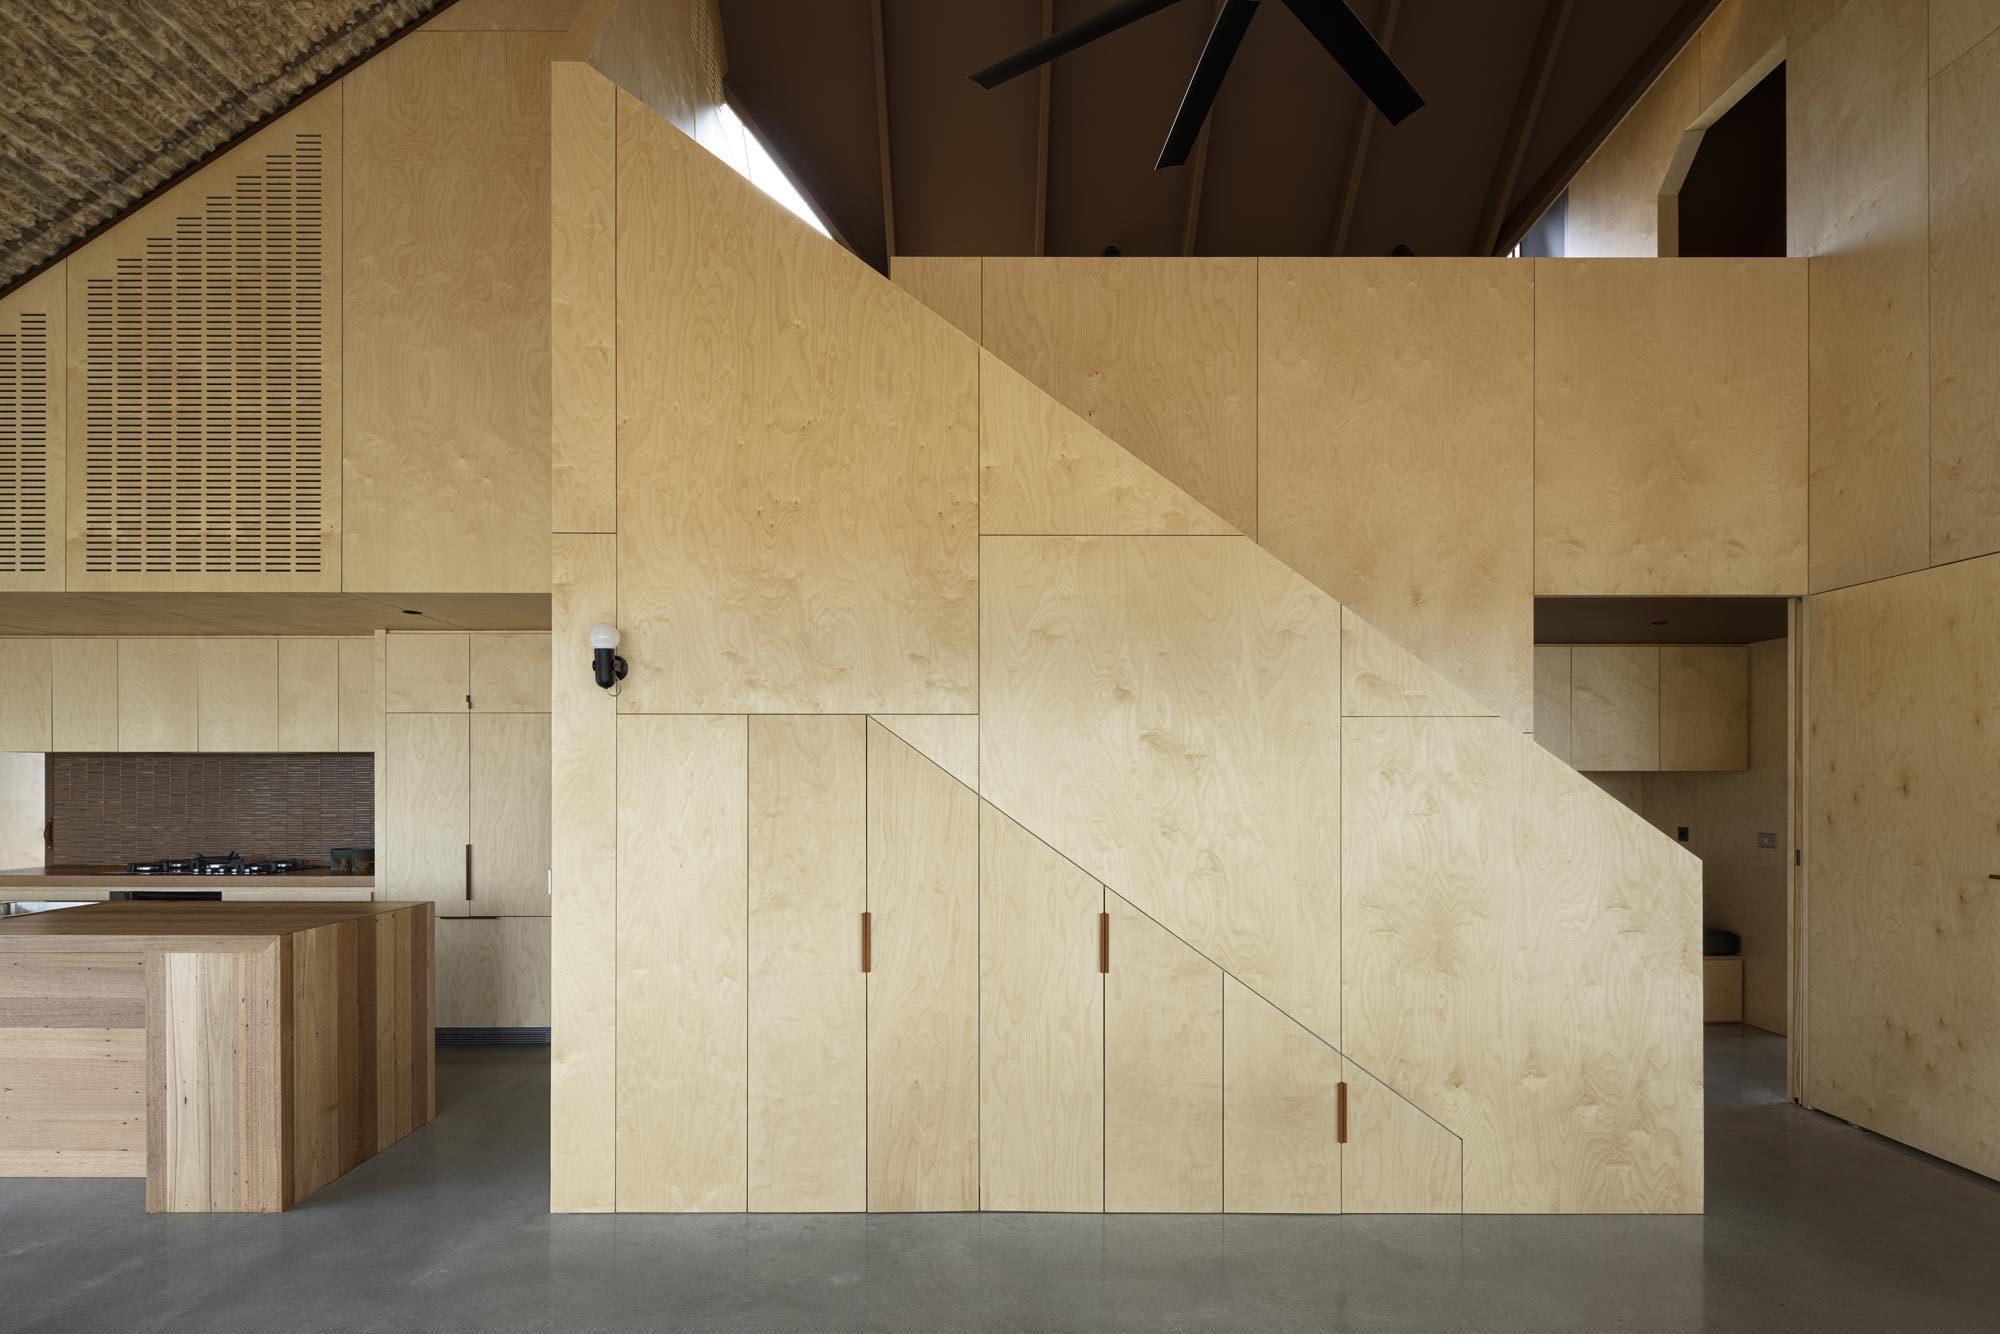 Coopworth, Bruny Island, Australien, FMD Architects, Foto: Dianna Snape